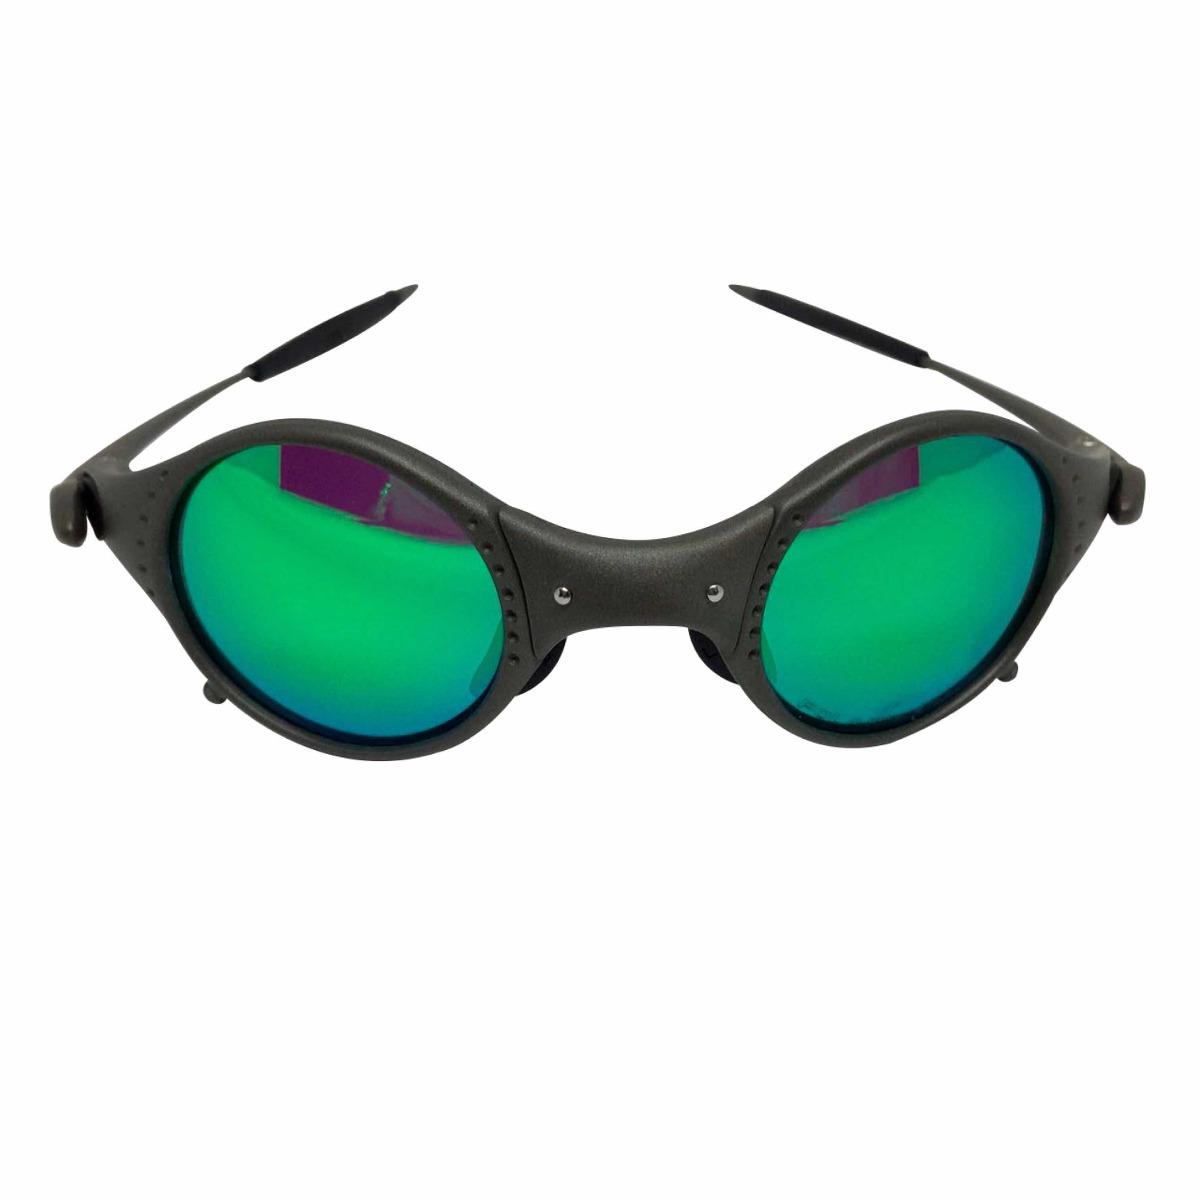 Oculos Oakley Juliet Mars Lentes Polarizadas - R  149,00 em Mercado ... f22ecdb992